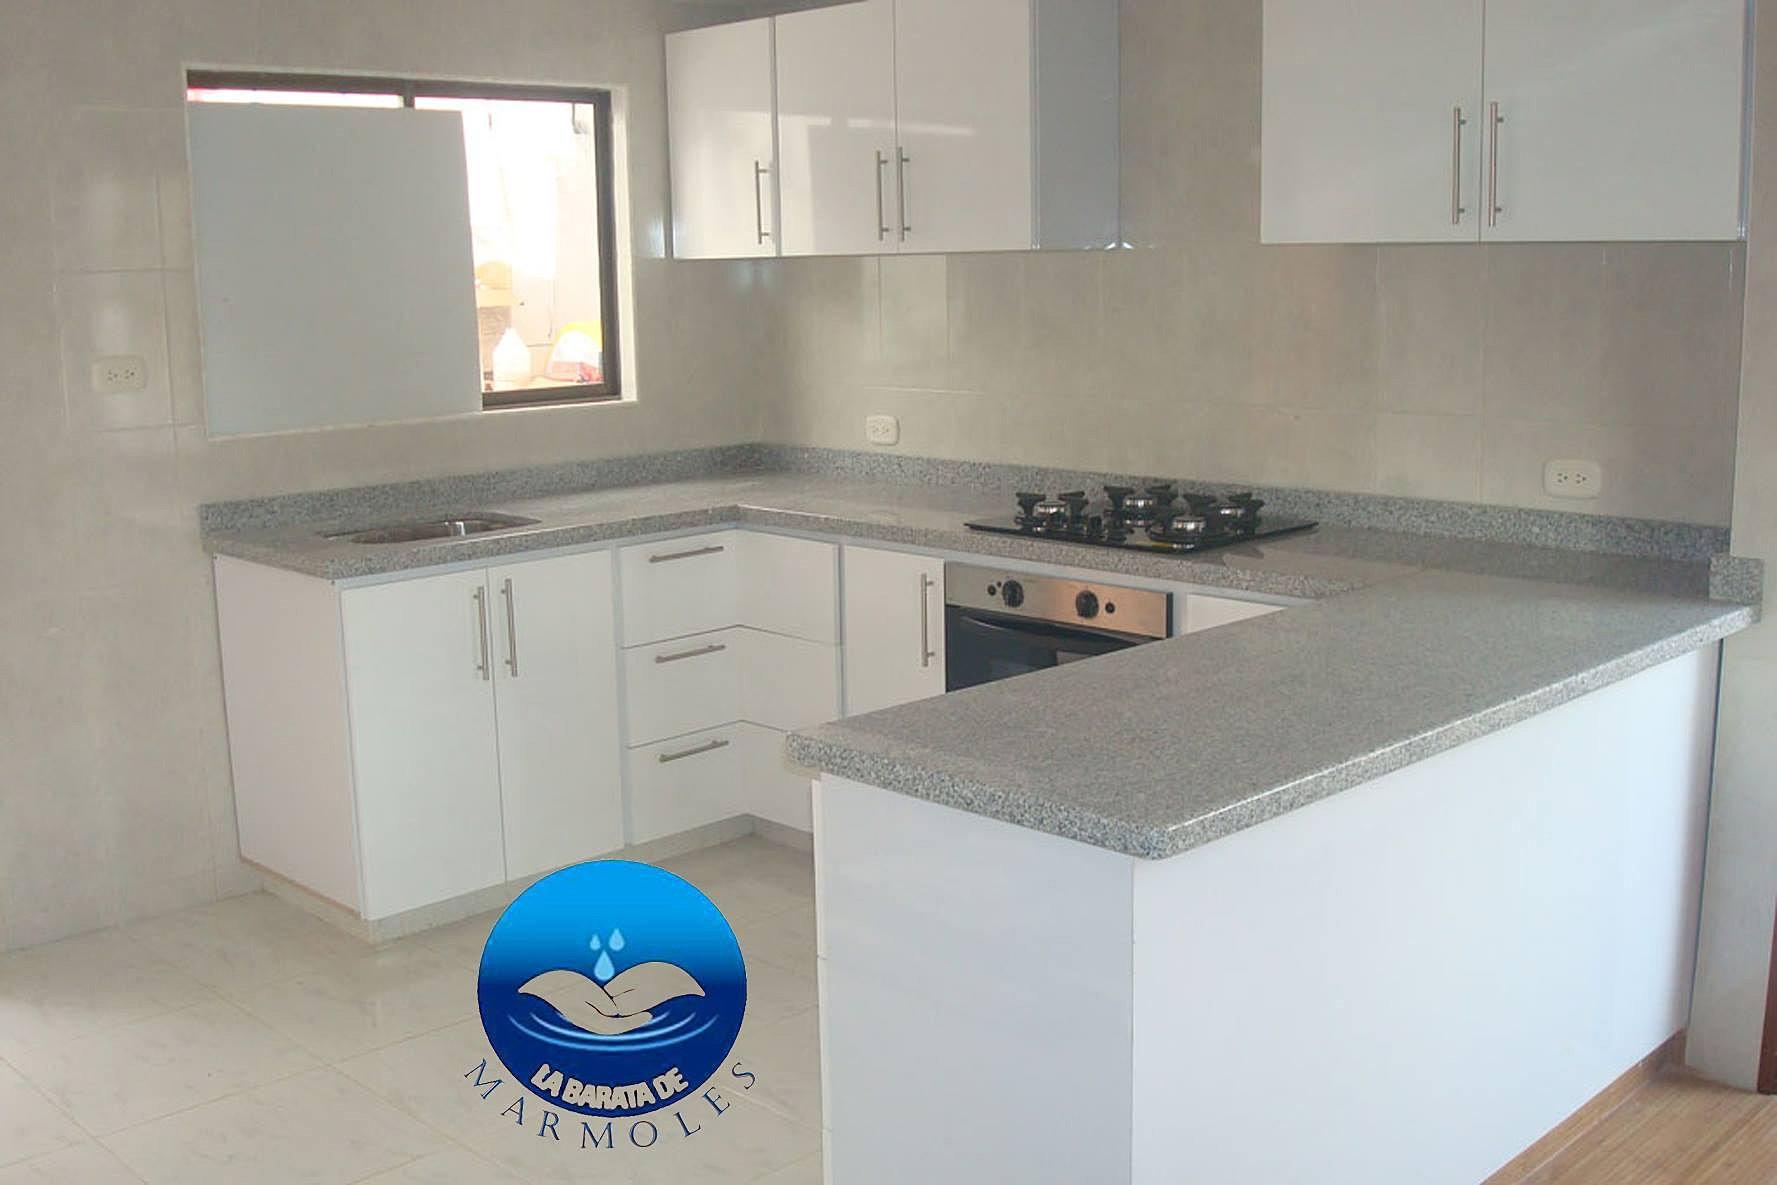 Lasmejorescocinas 11153381 820210624735050 126325218 for Cocinas modernas uruguay